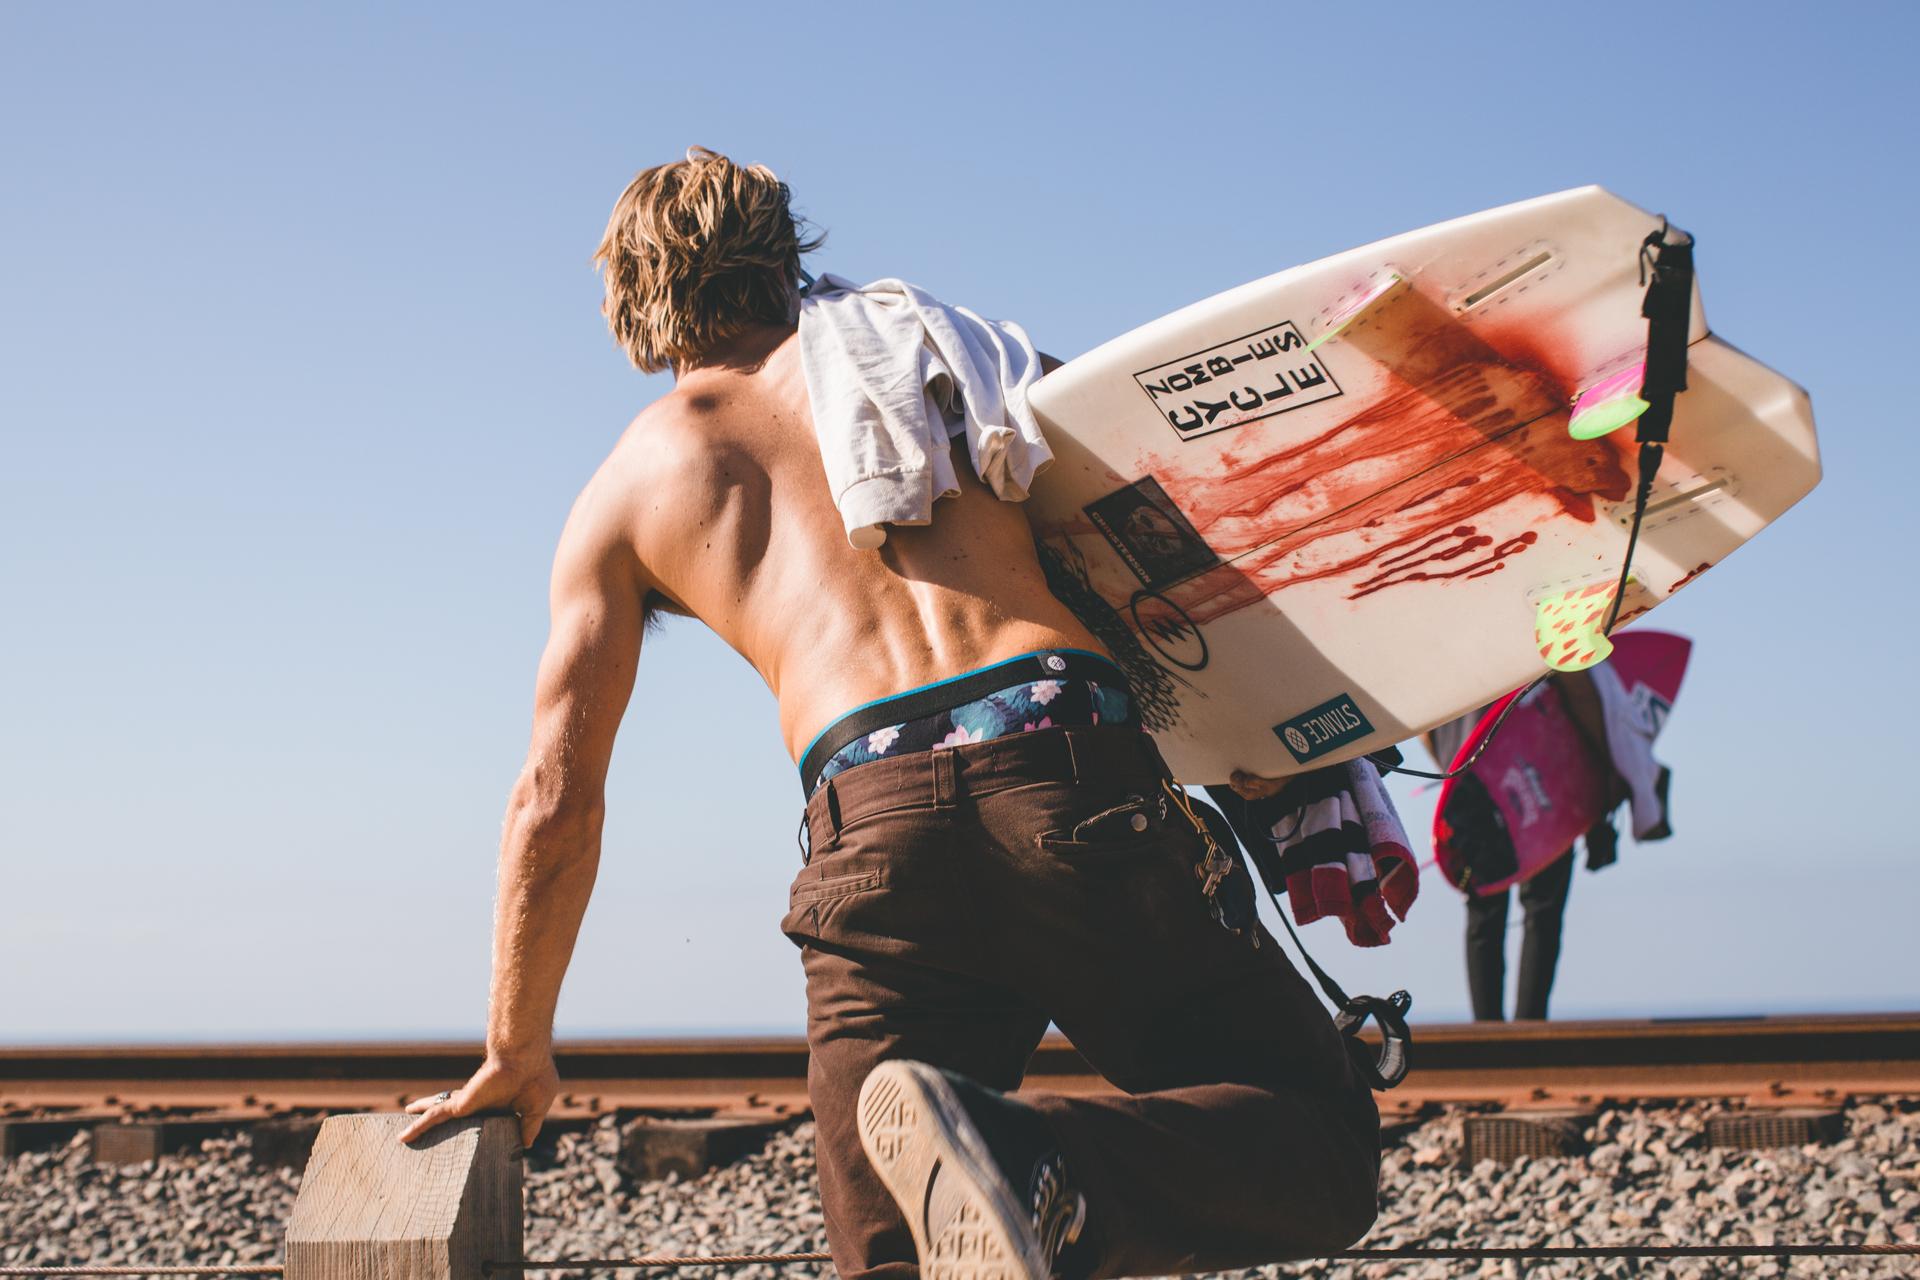 Stance-Underwear-ScottyStopnik.jpg